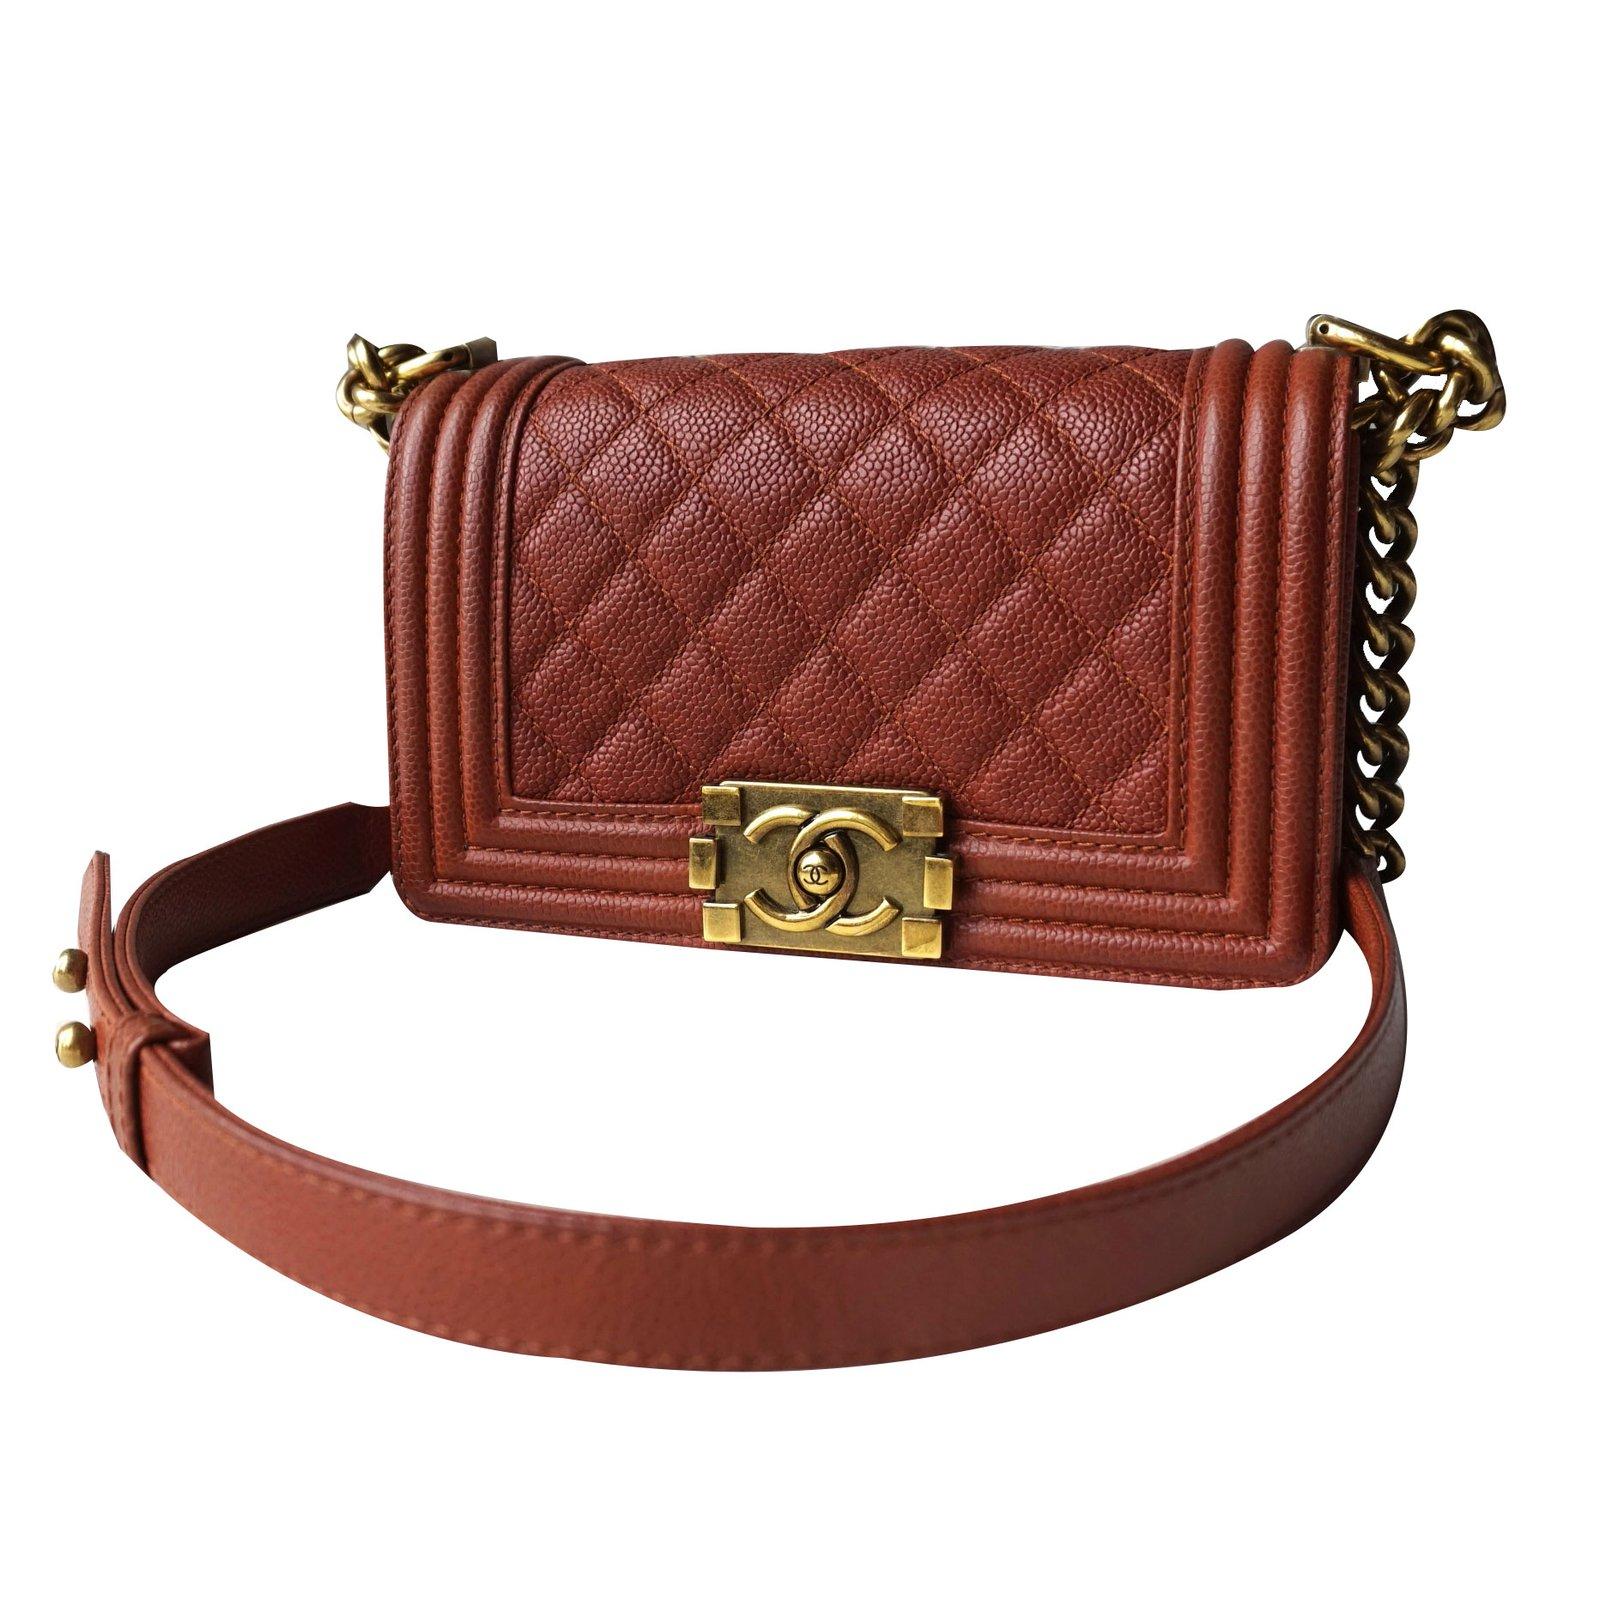 2f0580202f2bcb Chanel Boy Handbags Leather Dark Red Ref 24523 Joli Closet